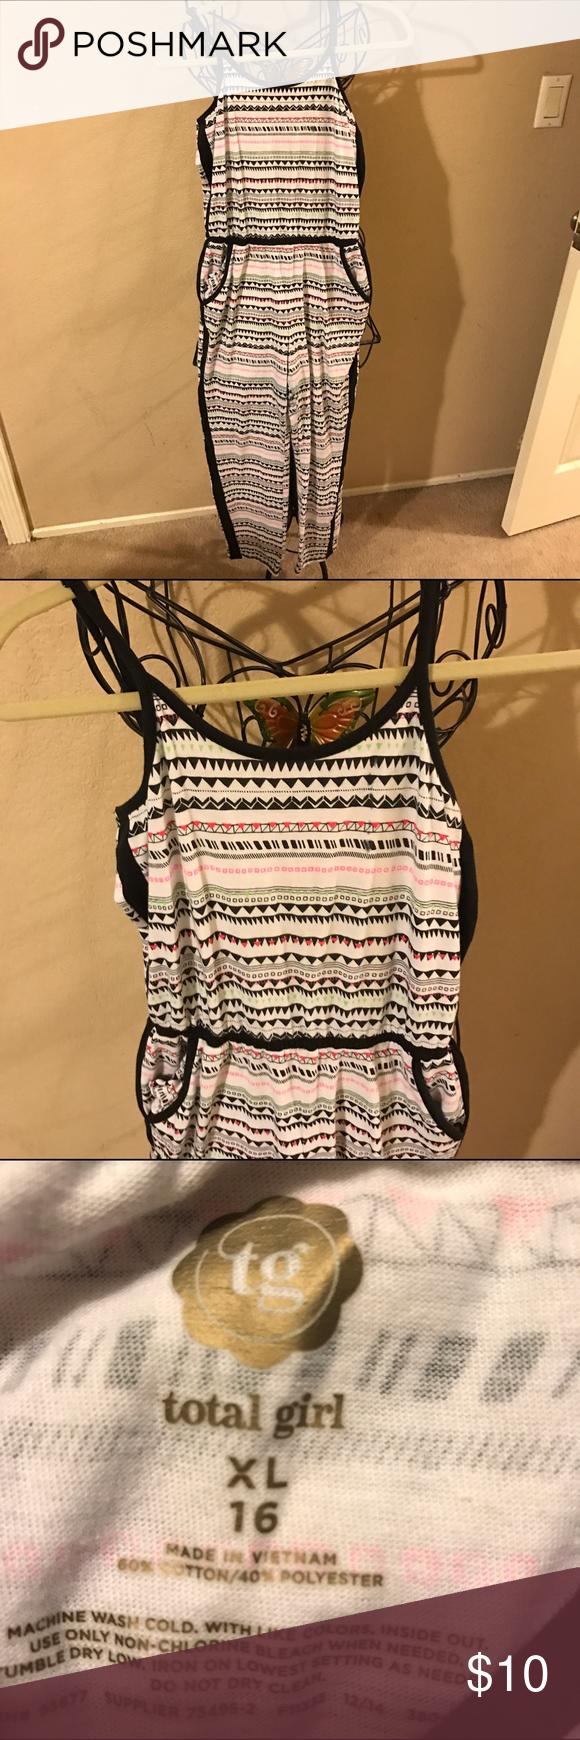 🎀Cute girls romper jumpsuit size XL 16 look🎀 Cute comfy romper total girl Dresses Casual